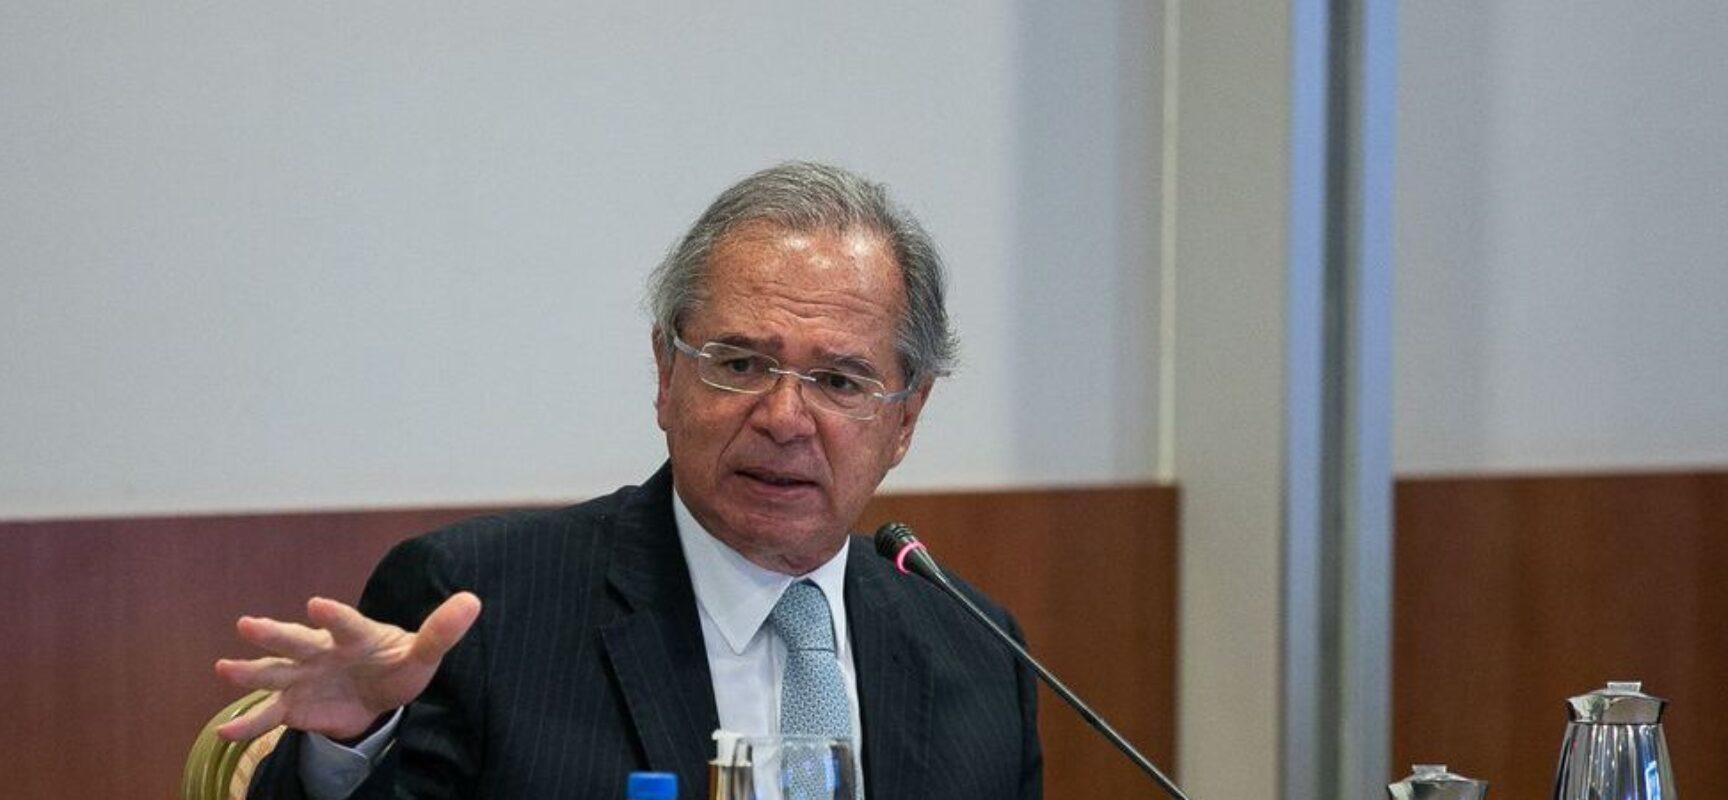 Guedes: auxílio emergencial pode ser renovado se pandemia continuar